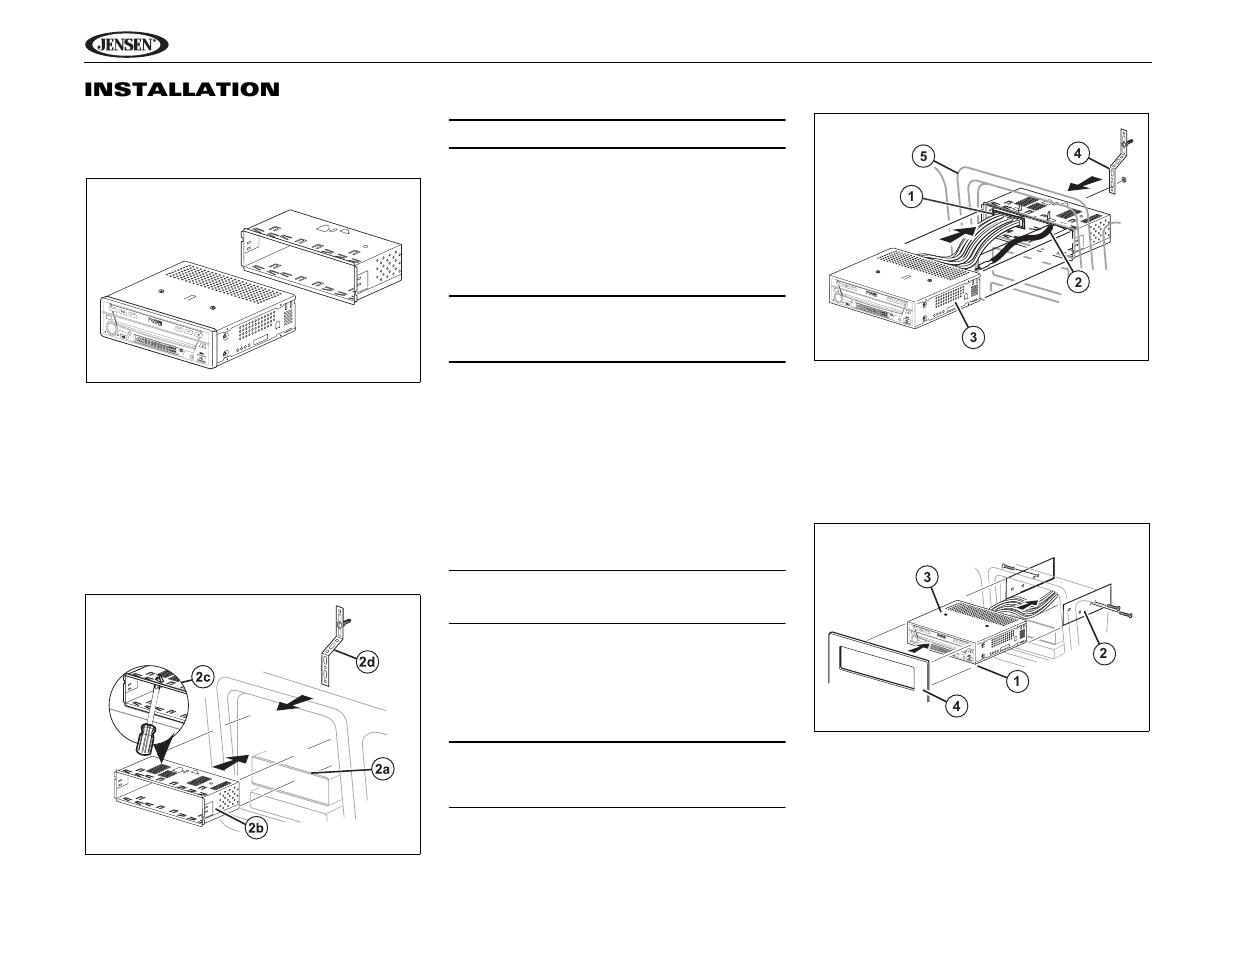 jensen vm9214 wiring diagram driving light relay uv9 25 images